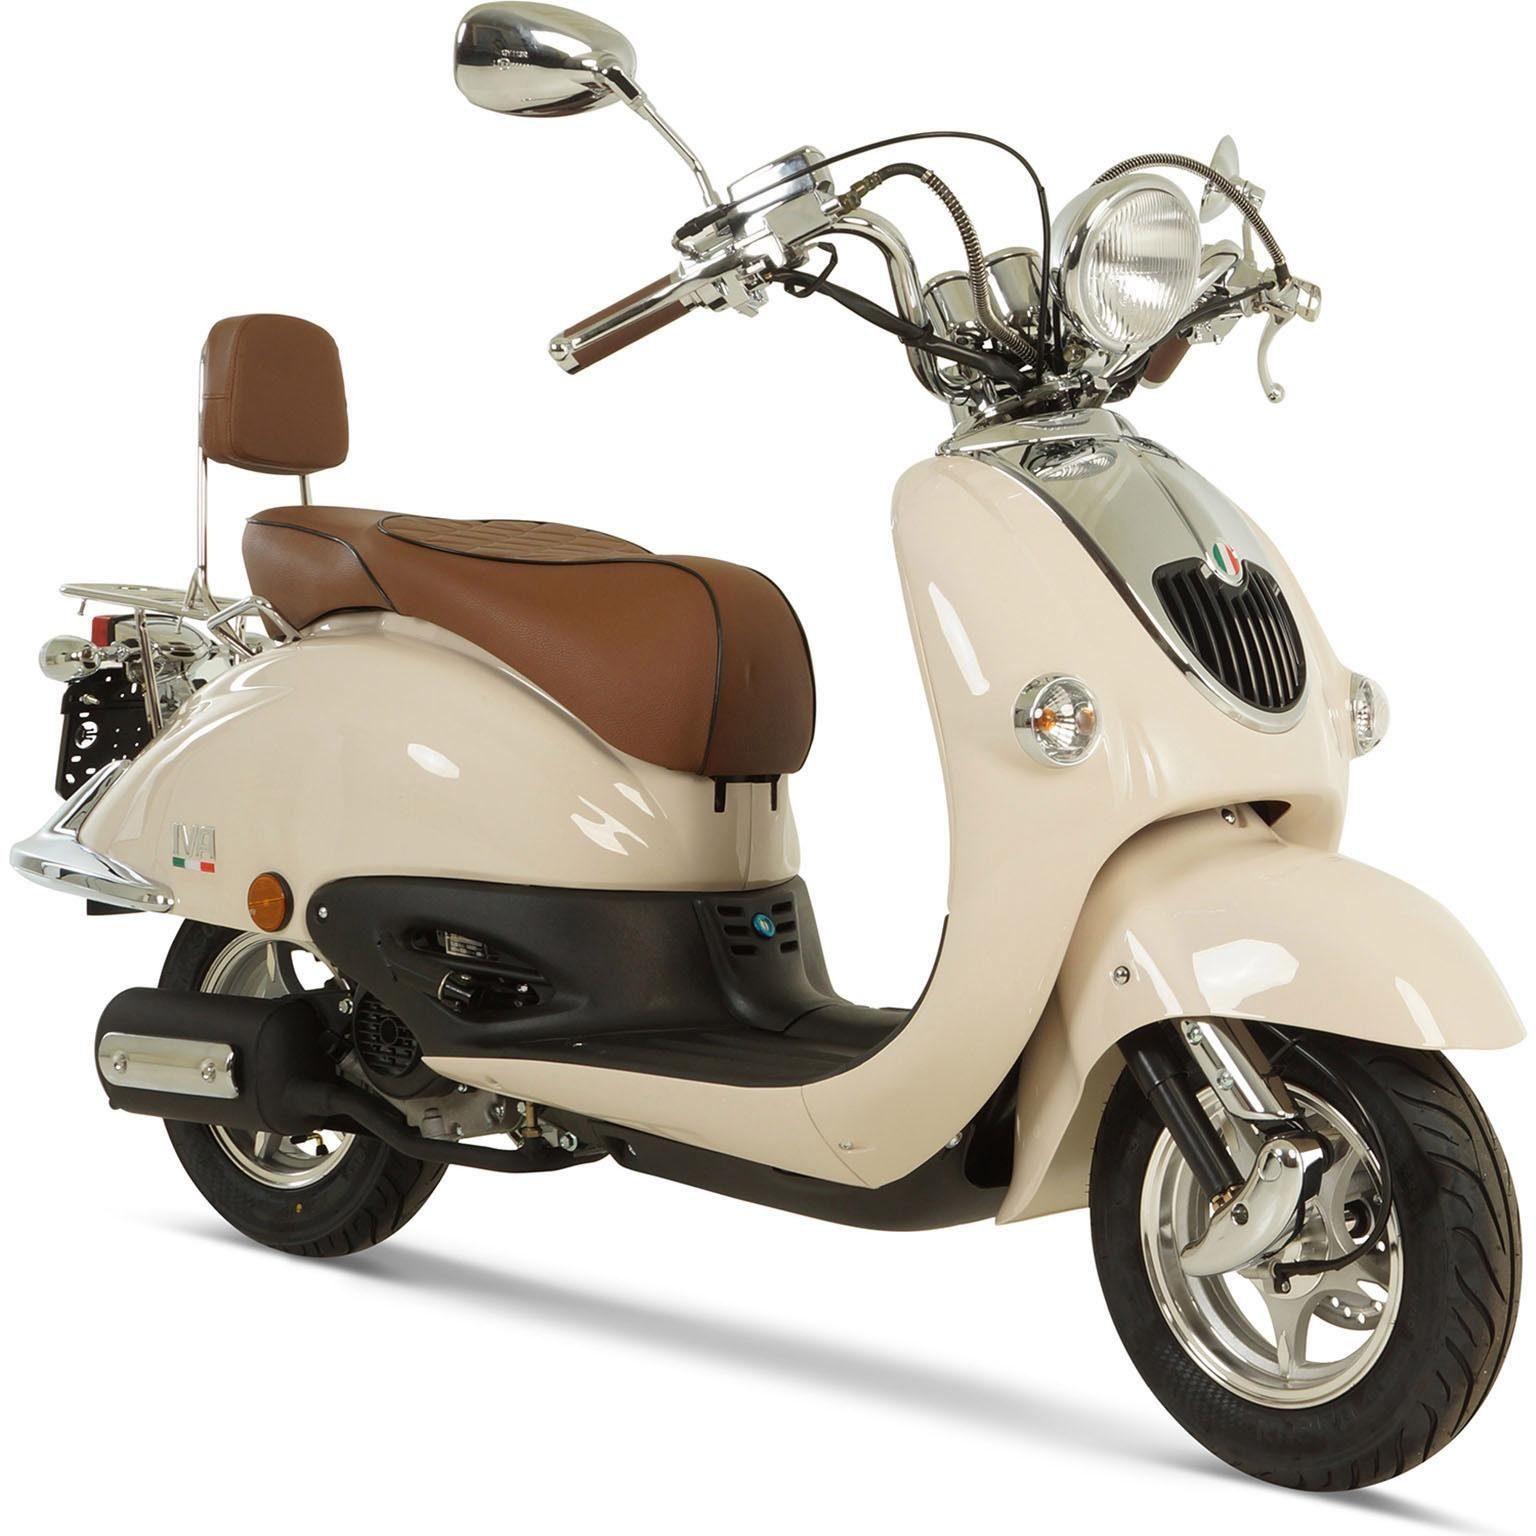 IVA Motorroller »Venice«, 50 ccm, 45 km/h, Euro 4